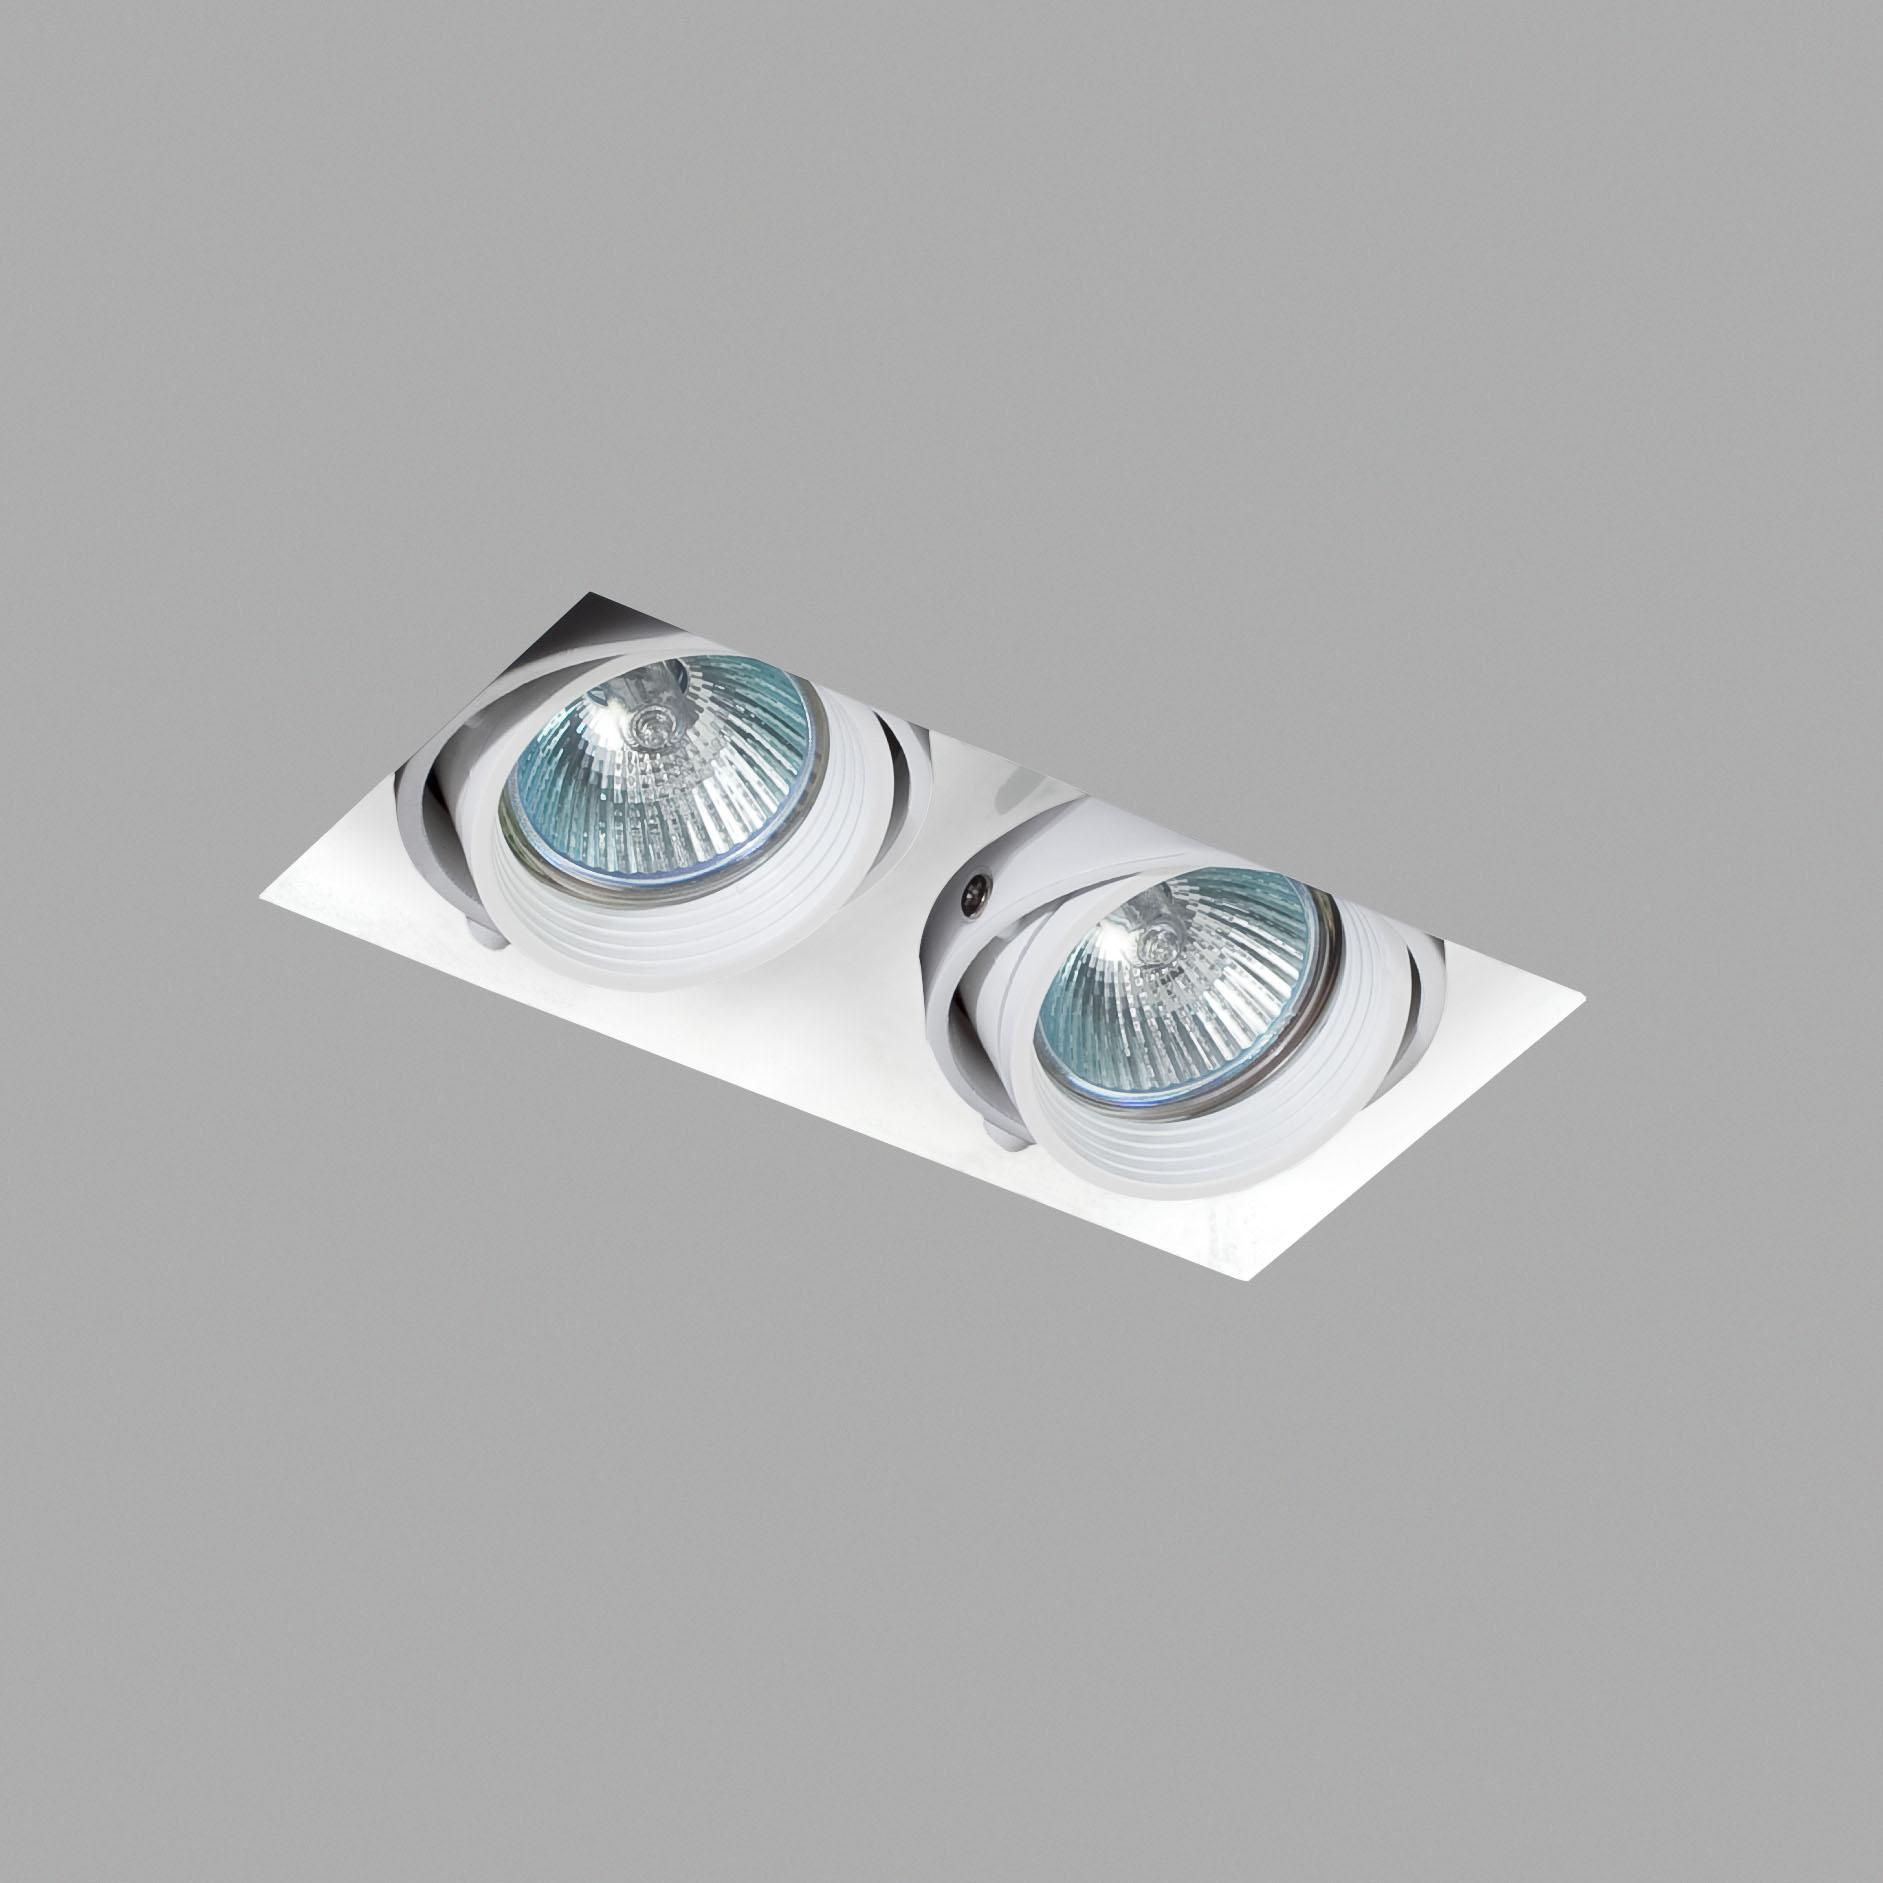 Led Spot wit verstelbaar IP23 227x143x123mm FALCON Trimless Faro